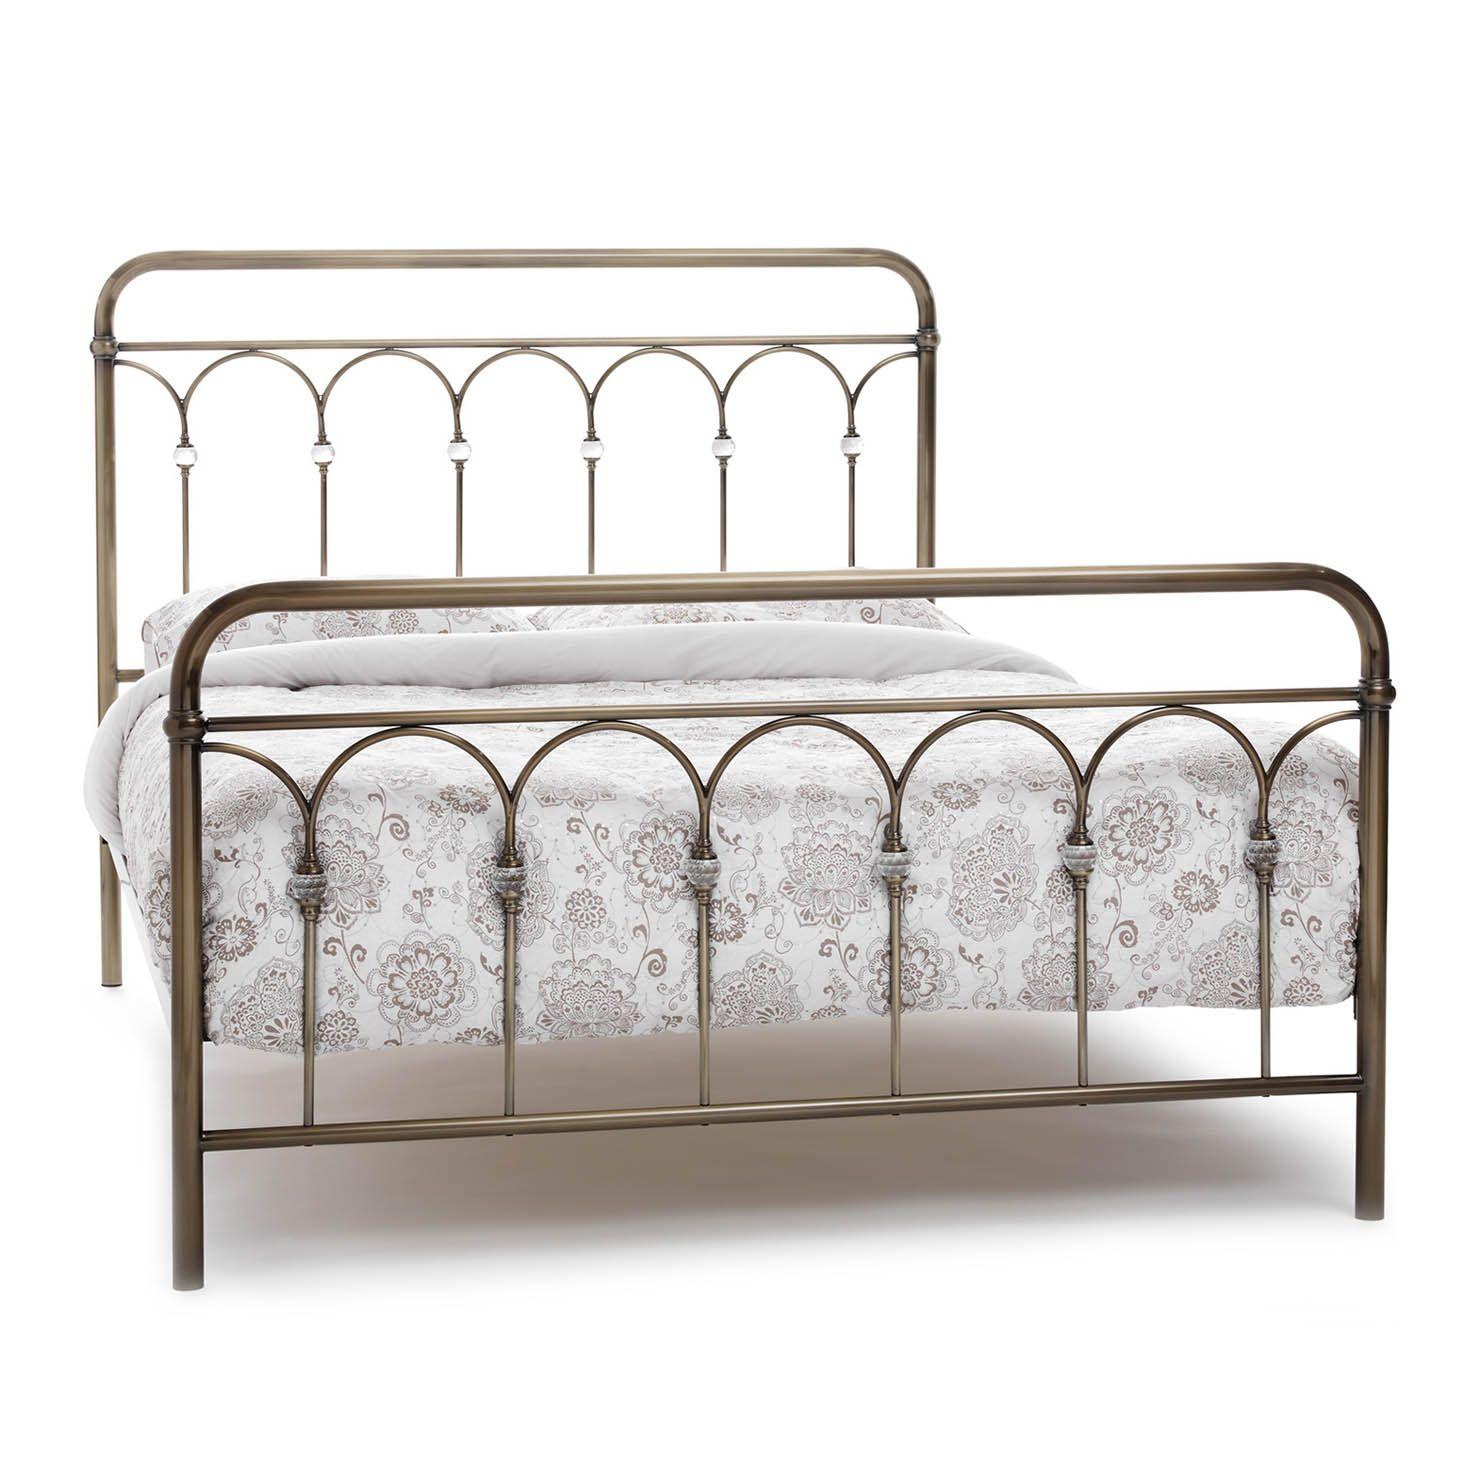 Shilton King Metal Bed Frame, Antique Brass   ACHICA   Pinterest ...